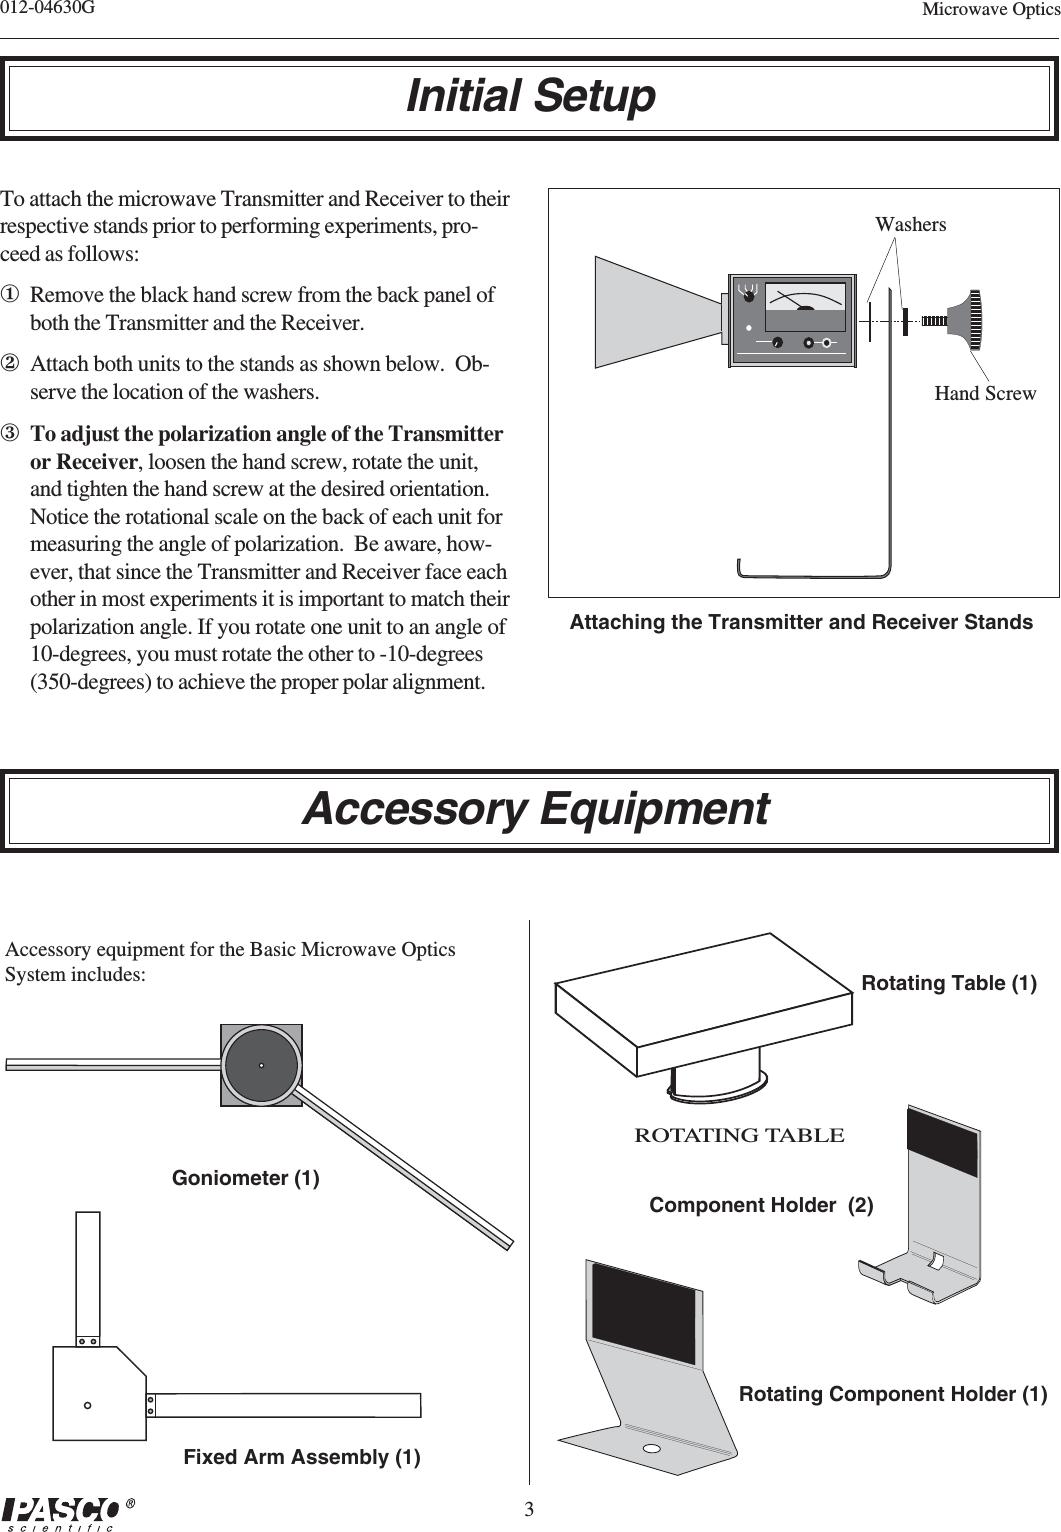 dxo optics pro 10 user guide pdf